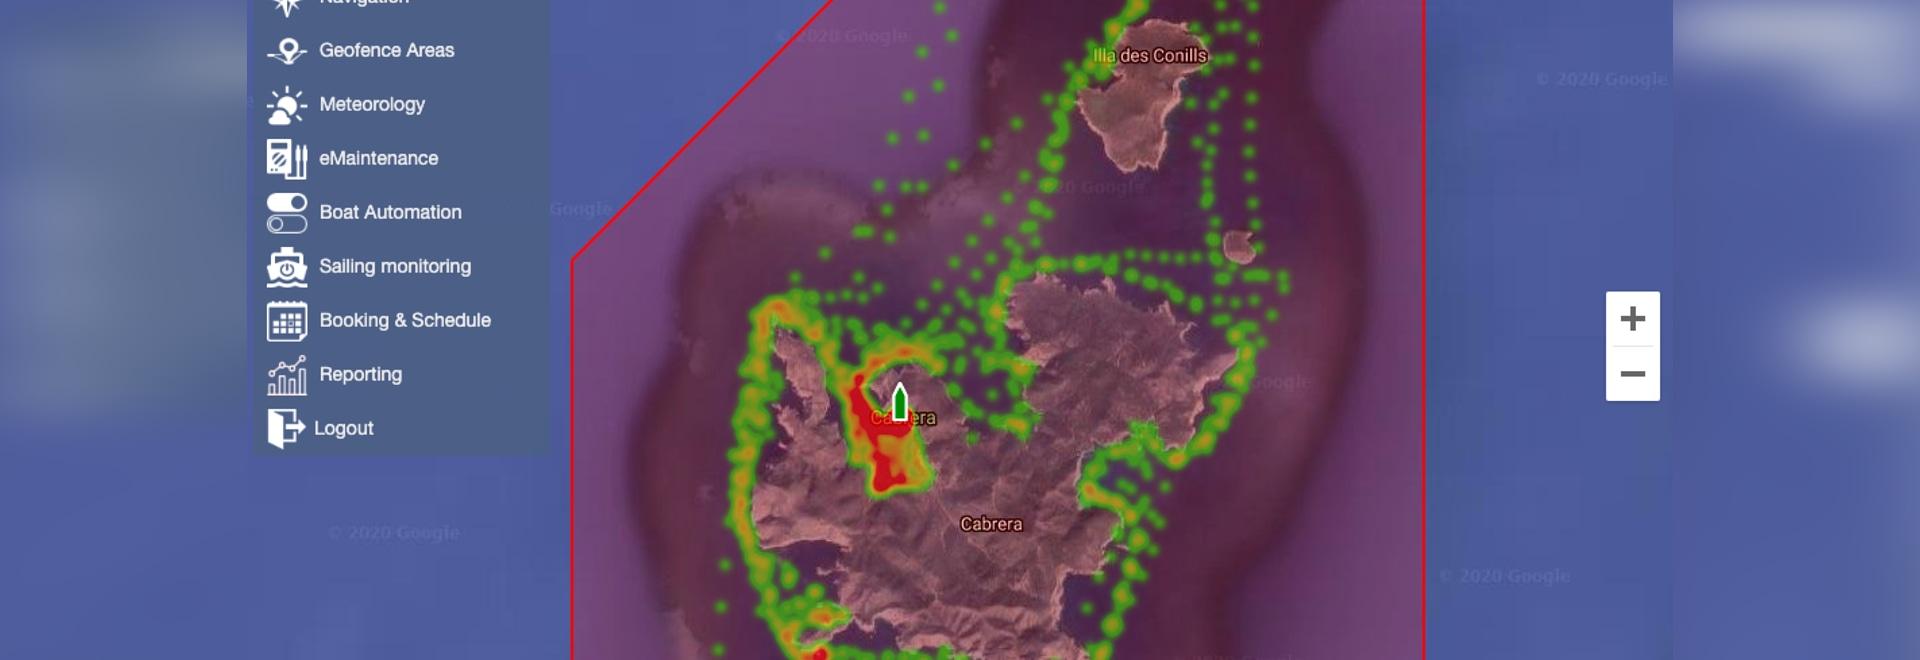 Maritime Area Integral Supervision